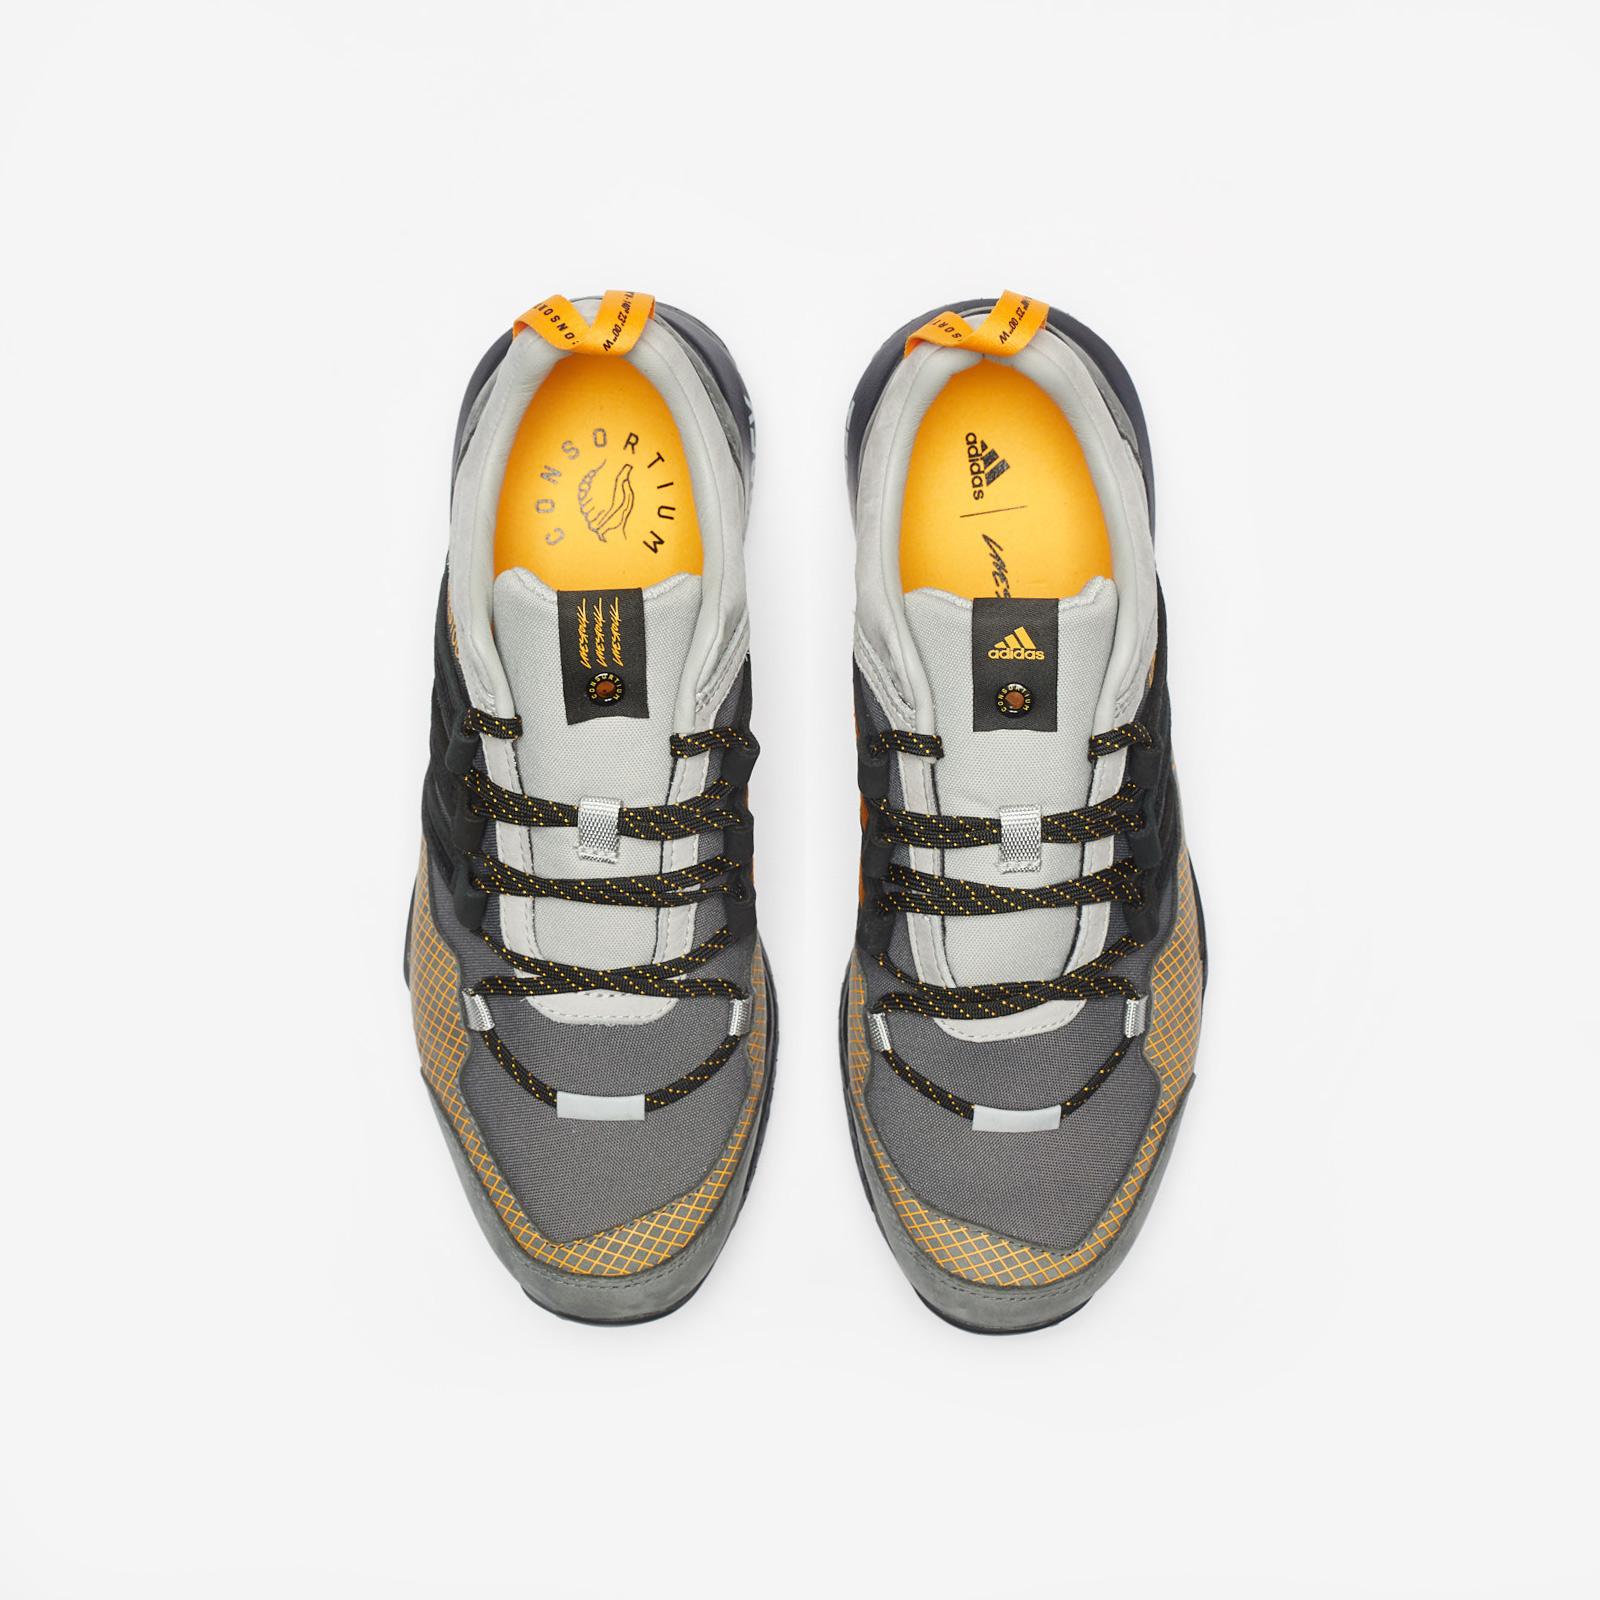 cba846538 adidas Terrex Skychaser LIVESTOCK - B37853 - Sneakersnstuff ...